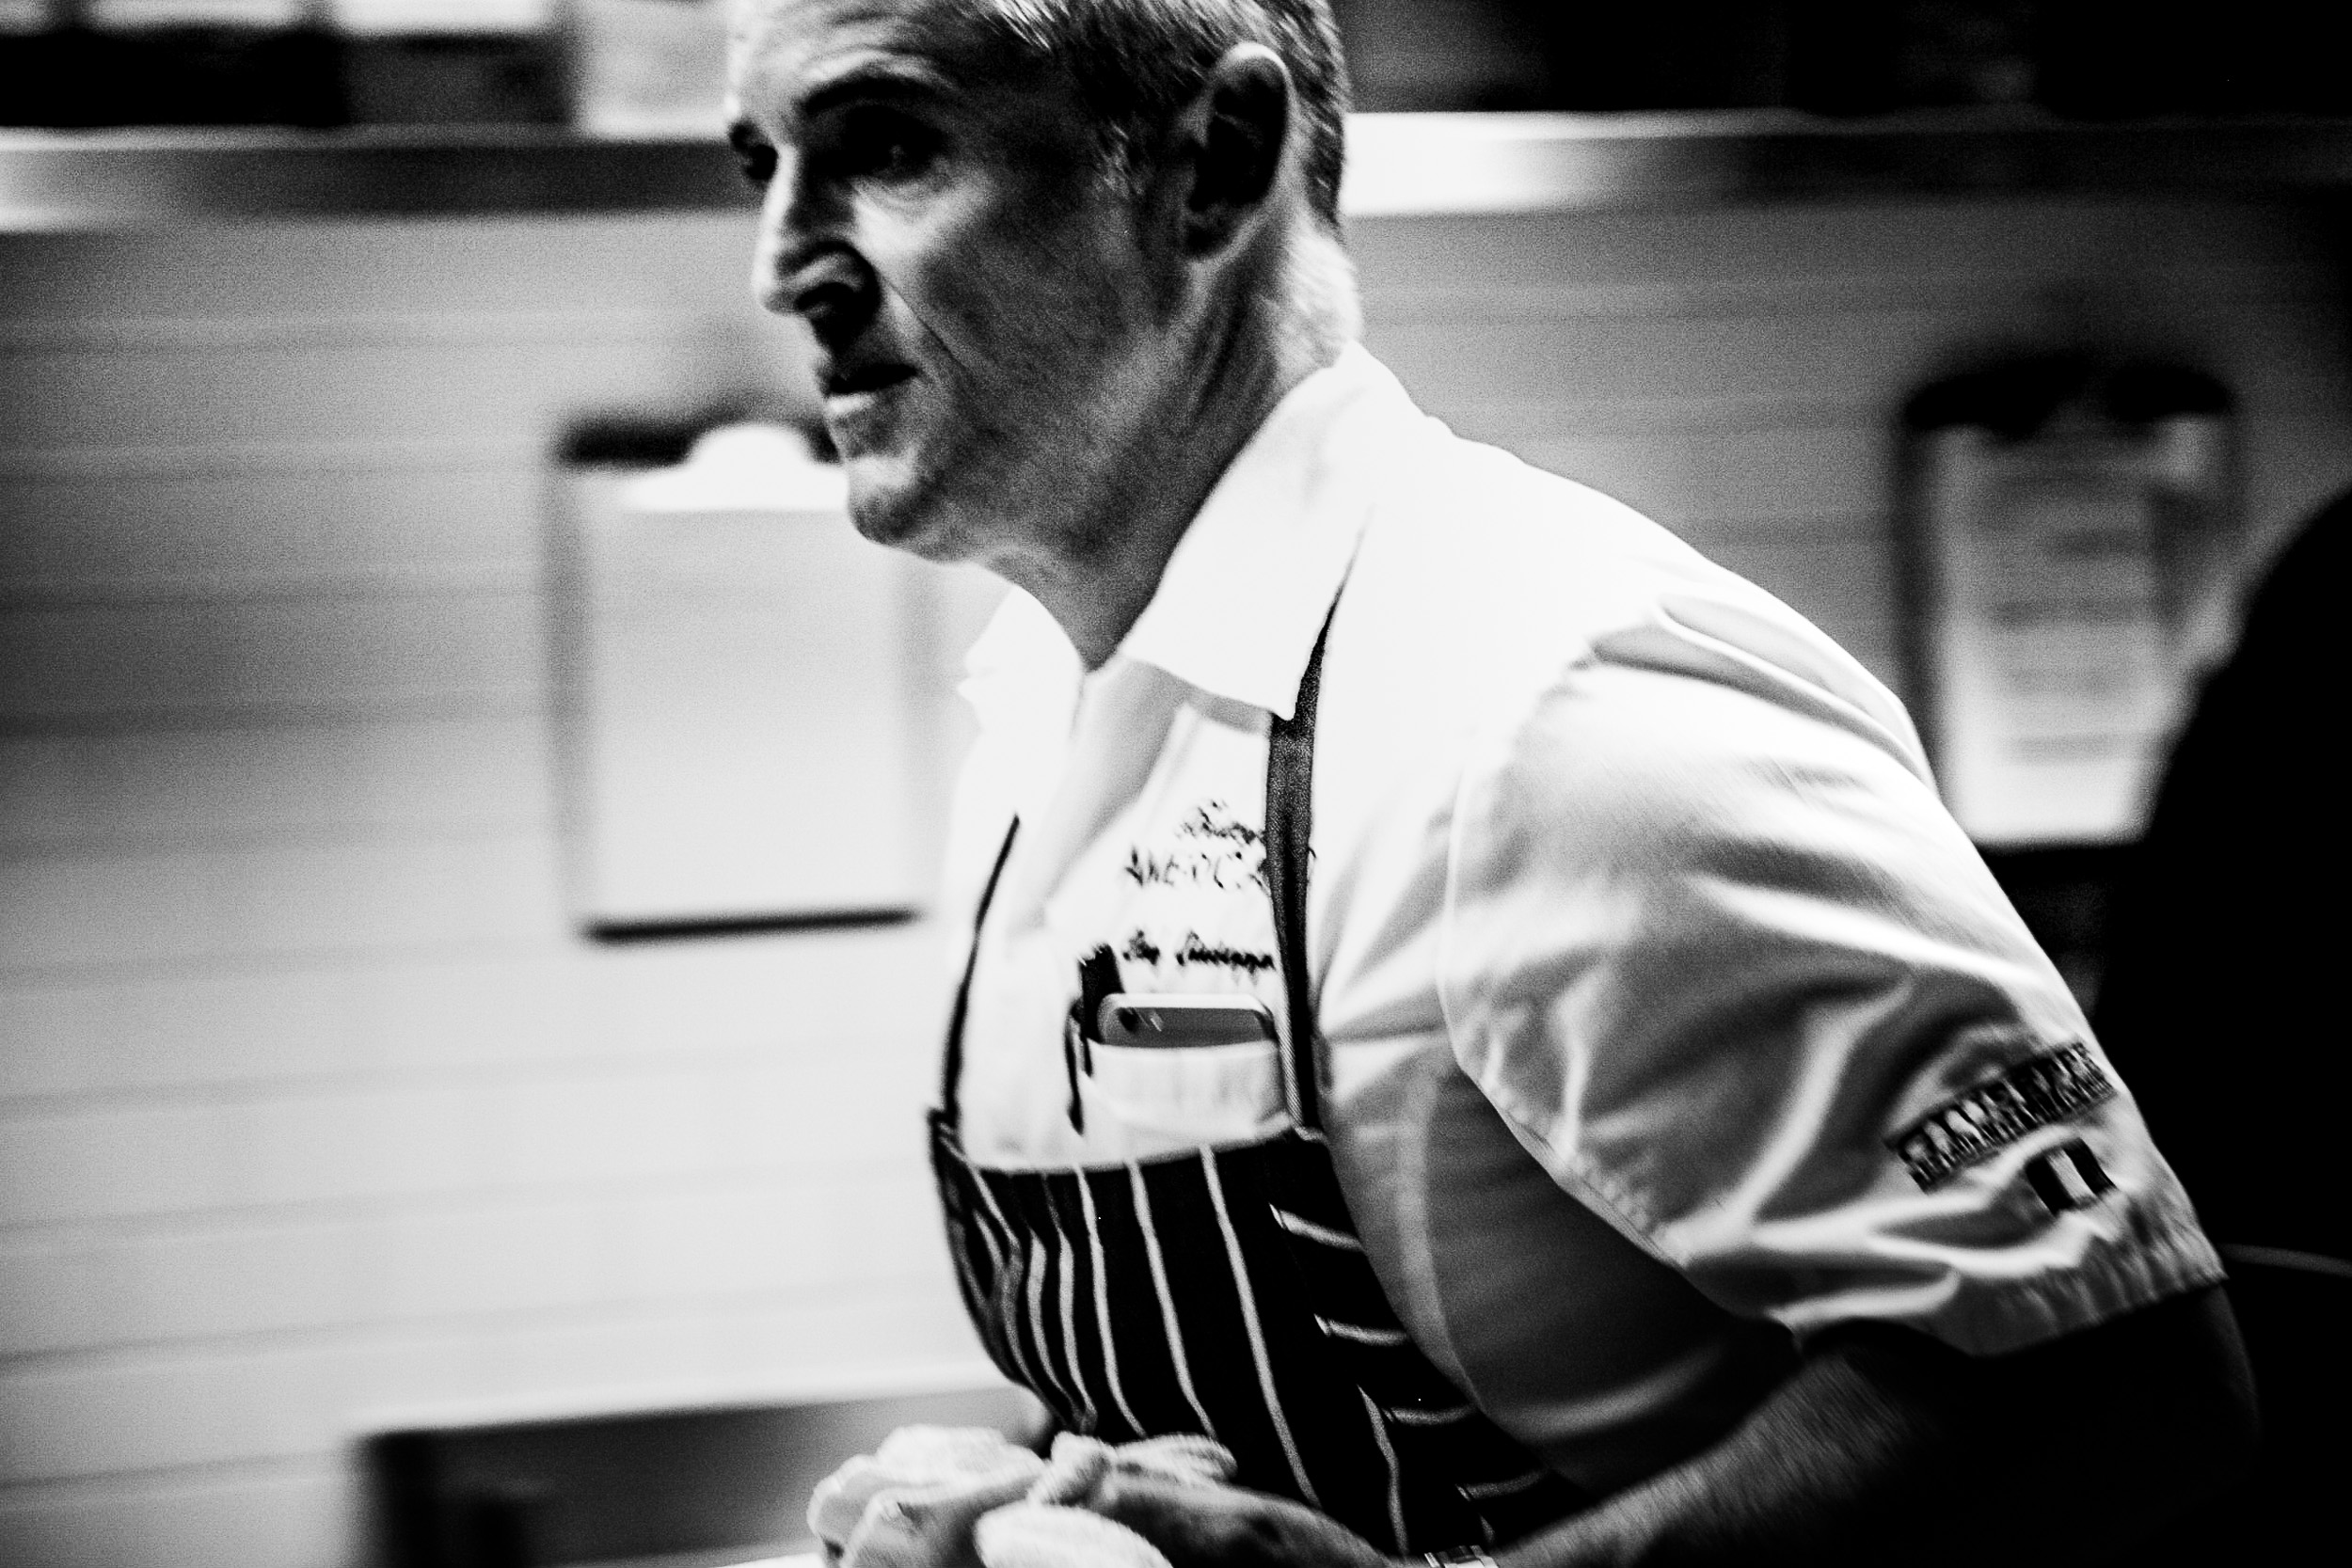 Giuseppe, Restauranteur